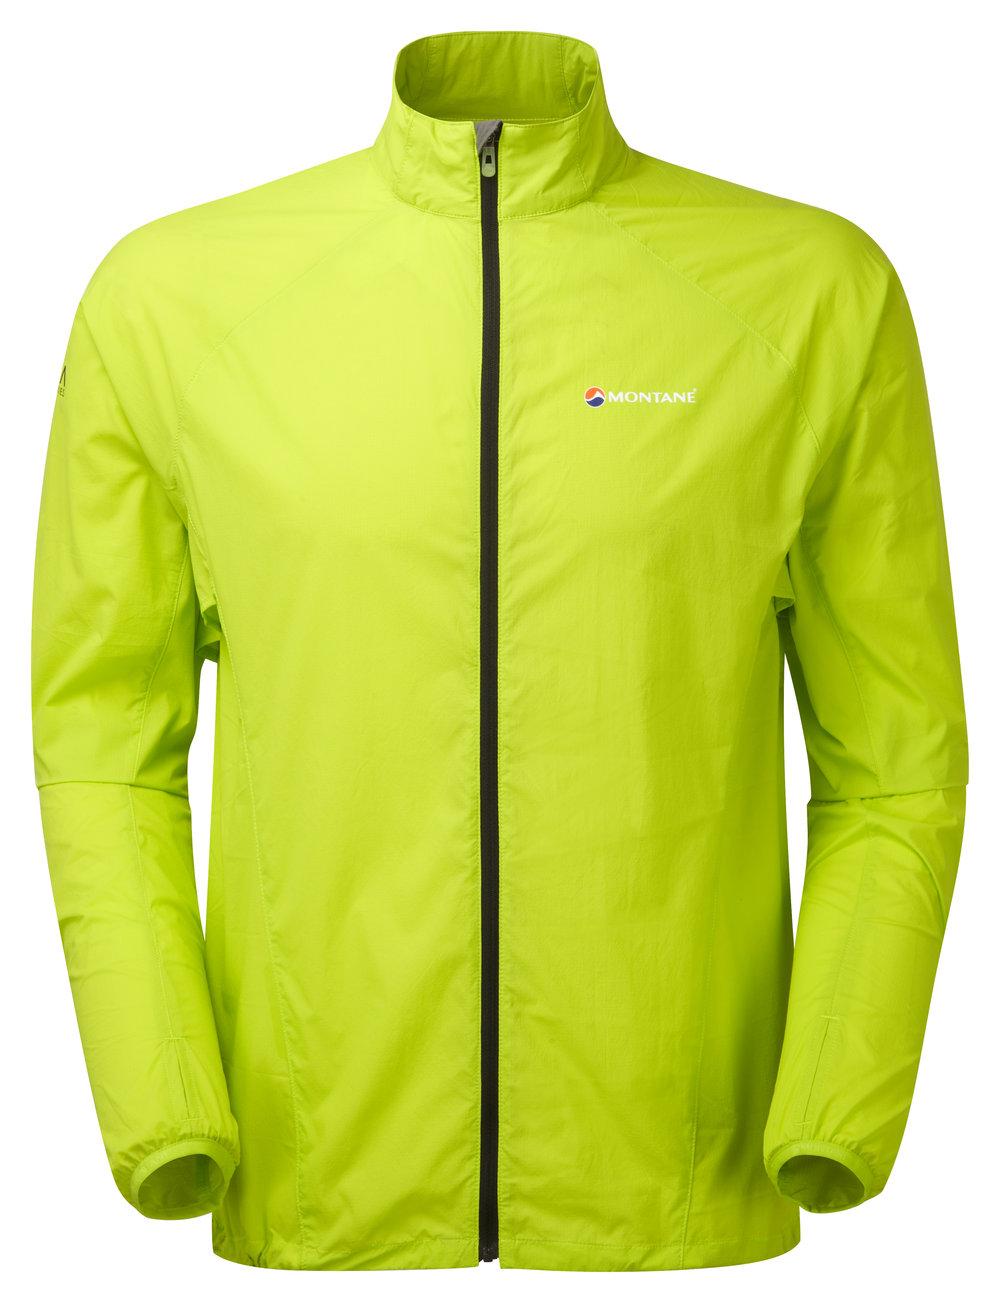 Montane Men's Featherlite Trail Jacket £75